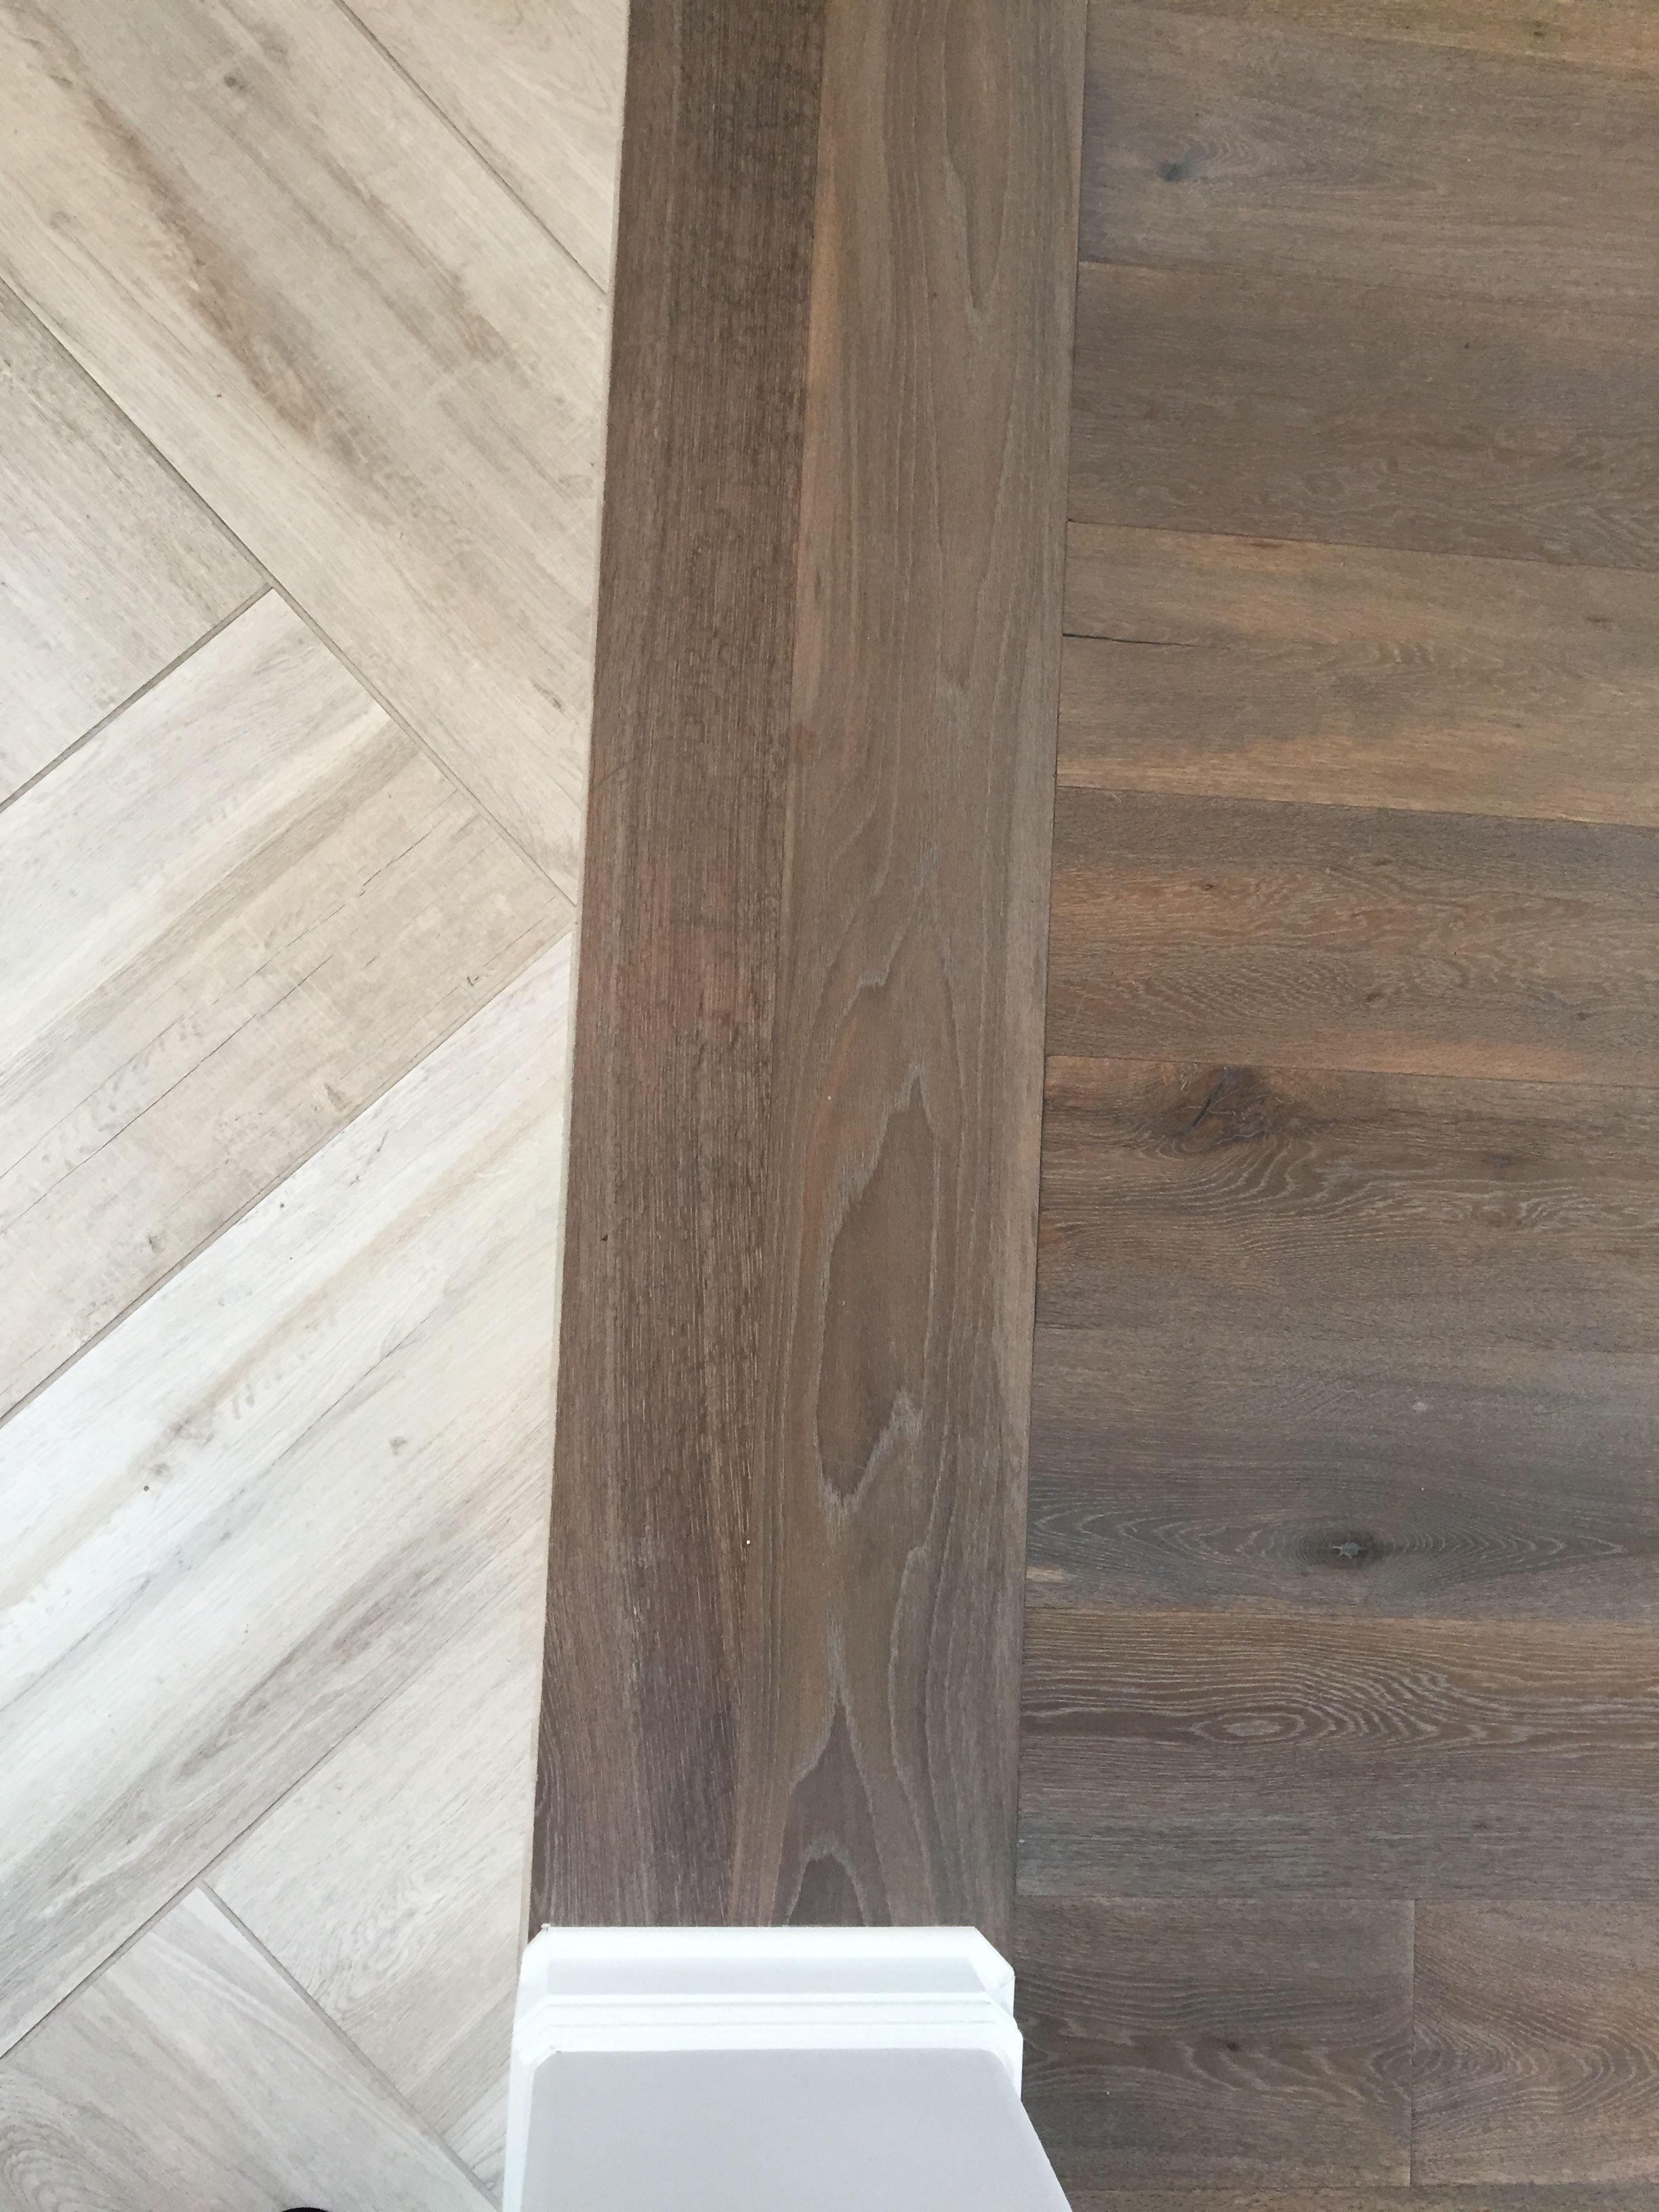 vintage hardwood flooring halifax ns of floor transition laminate to herringbone tile pattern model in floor transition laminate to herringbone tile pattern